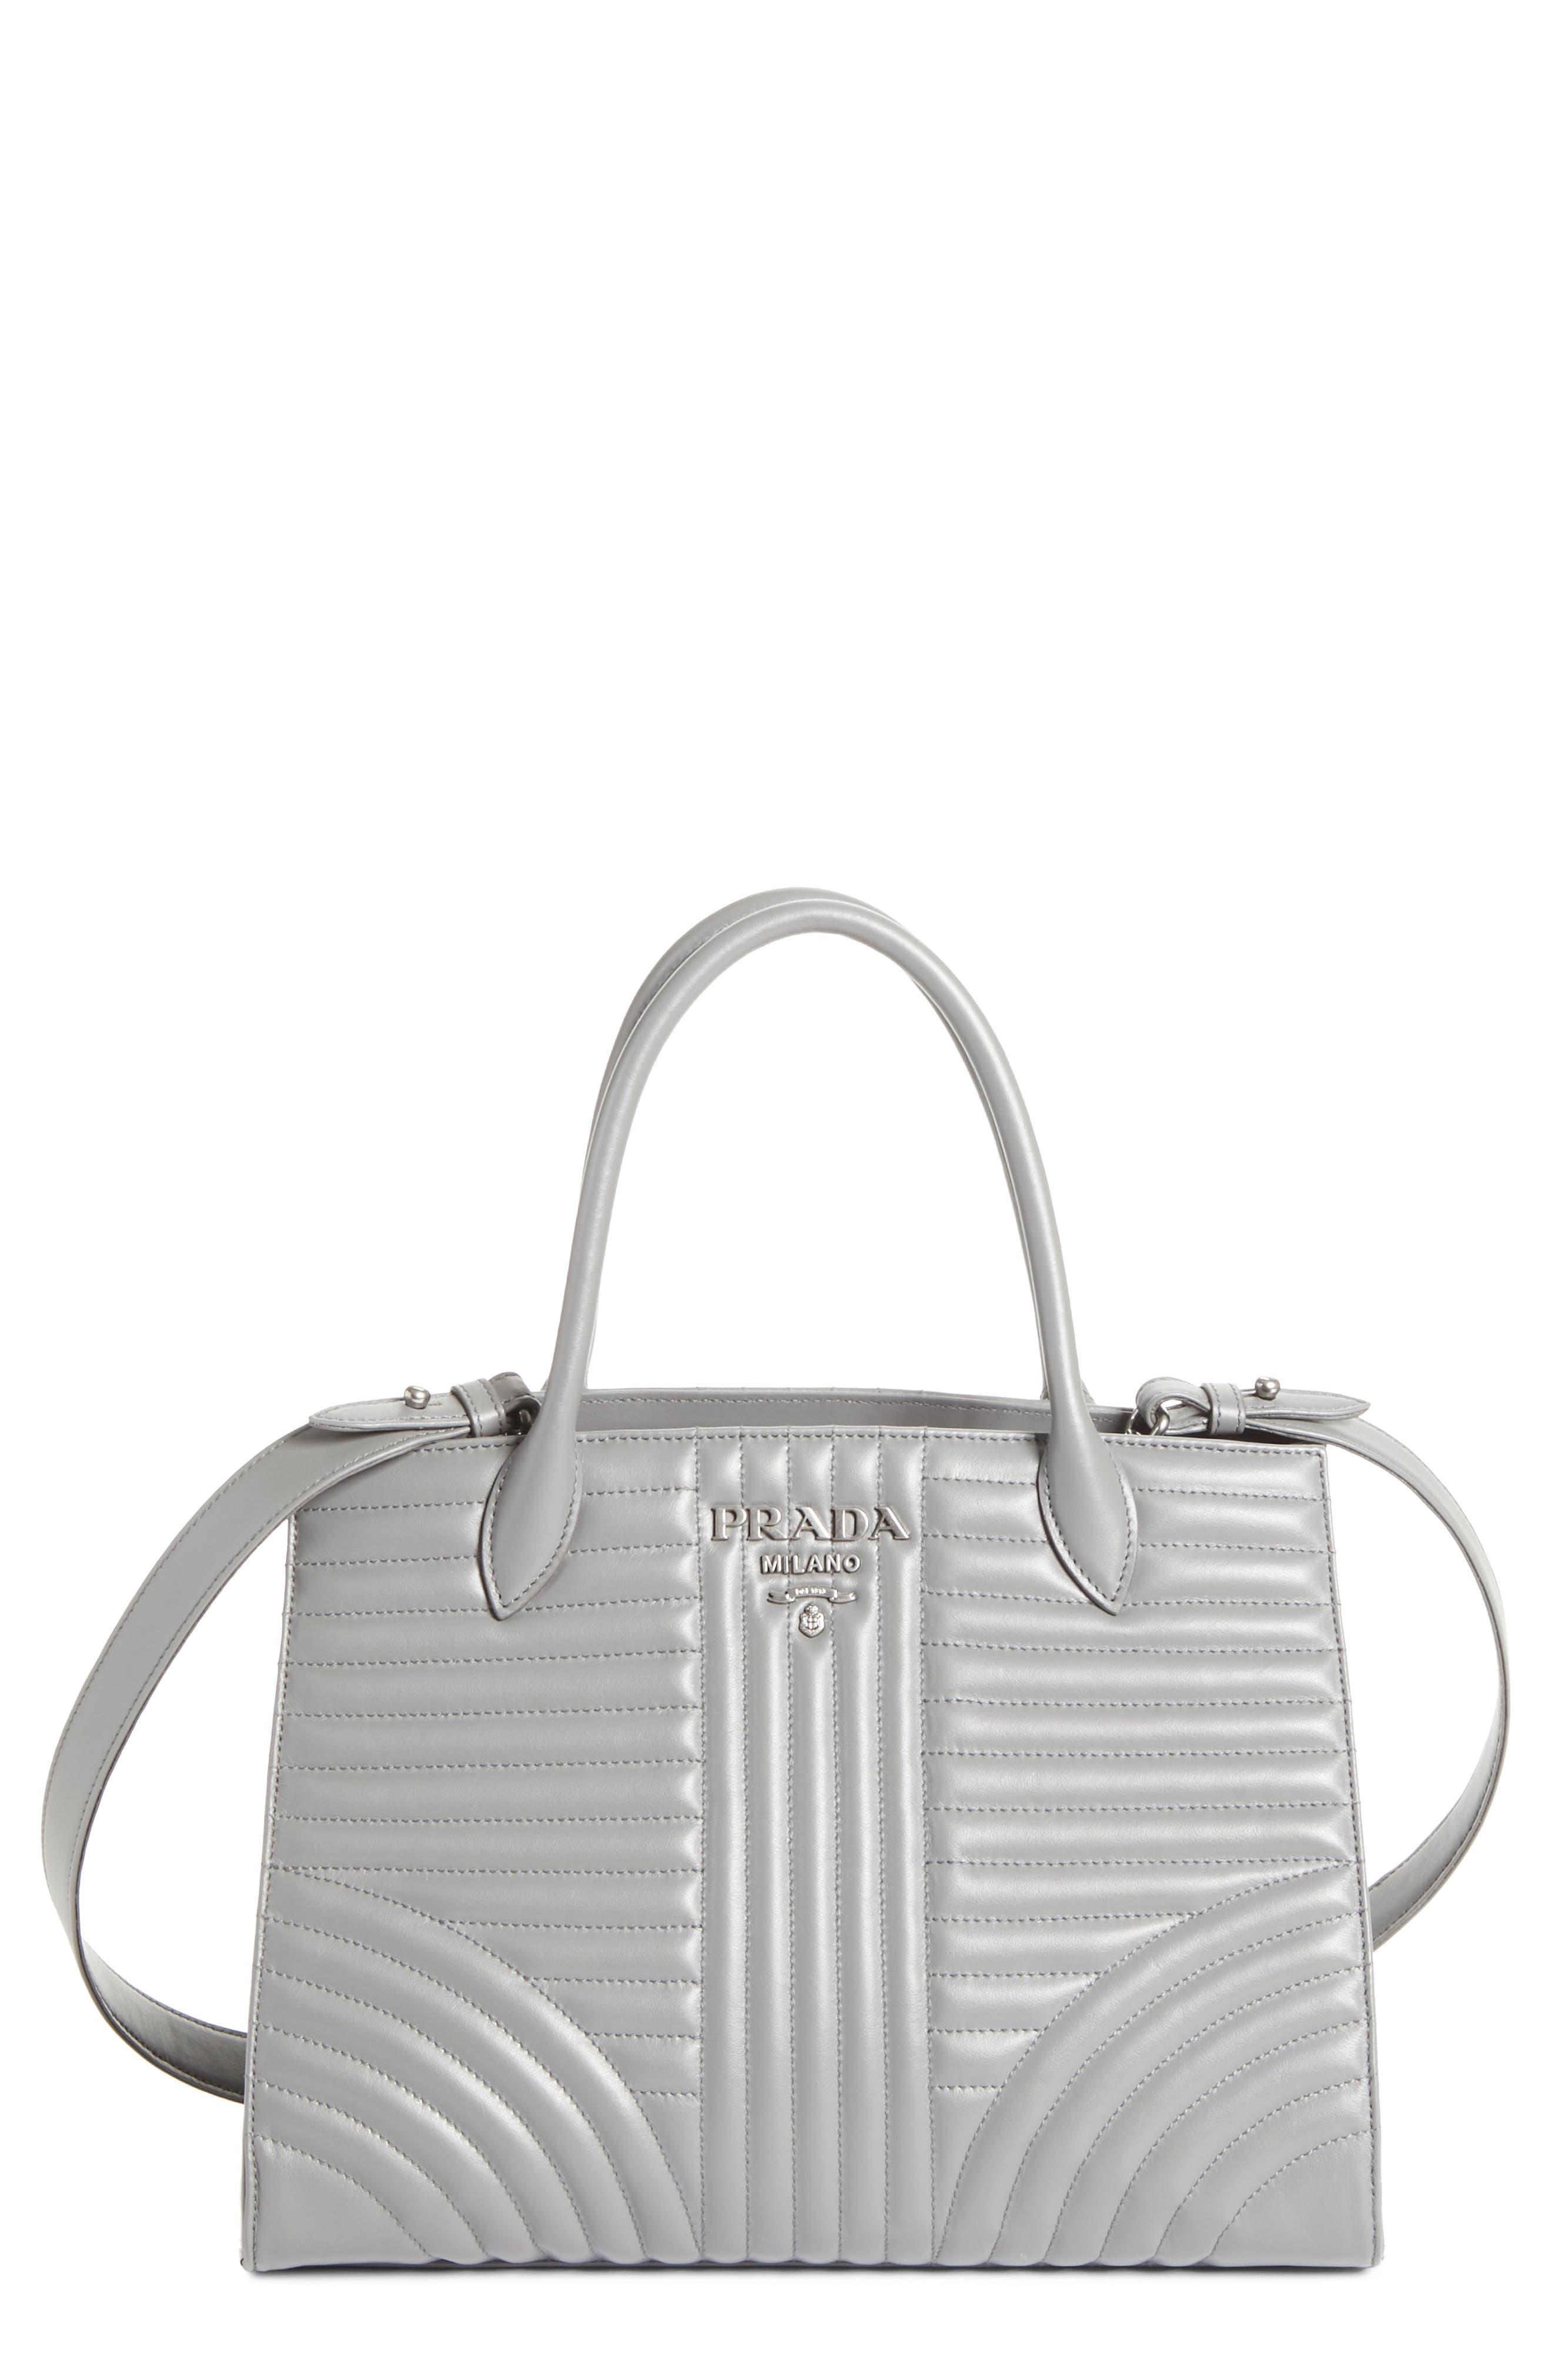 94edbe7a853e96 Prada Handbags & Purses | Nordstrom